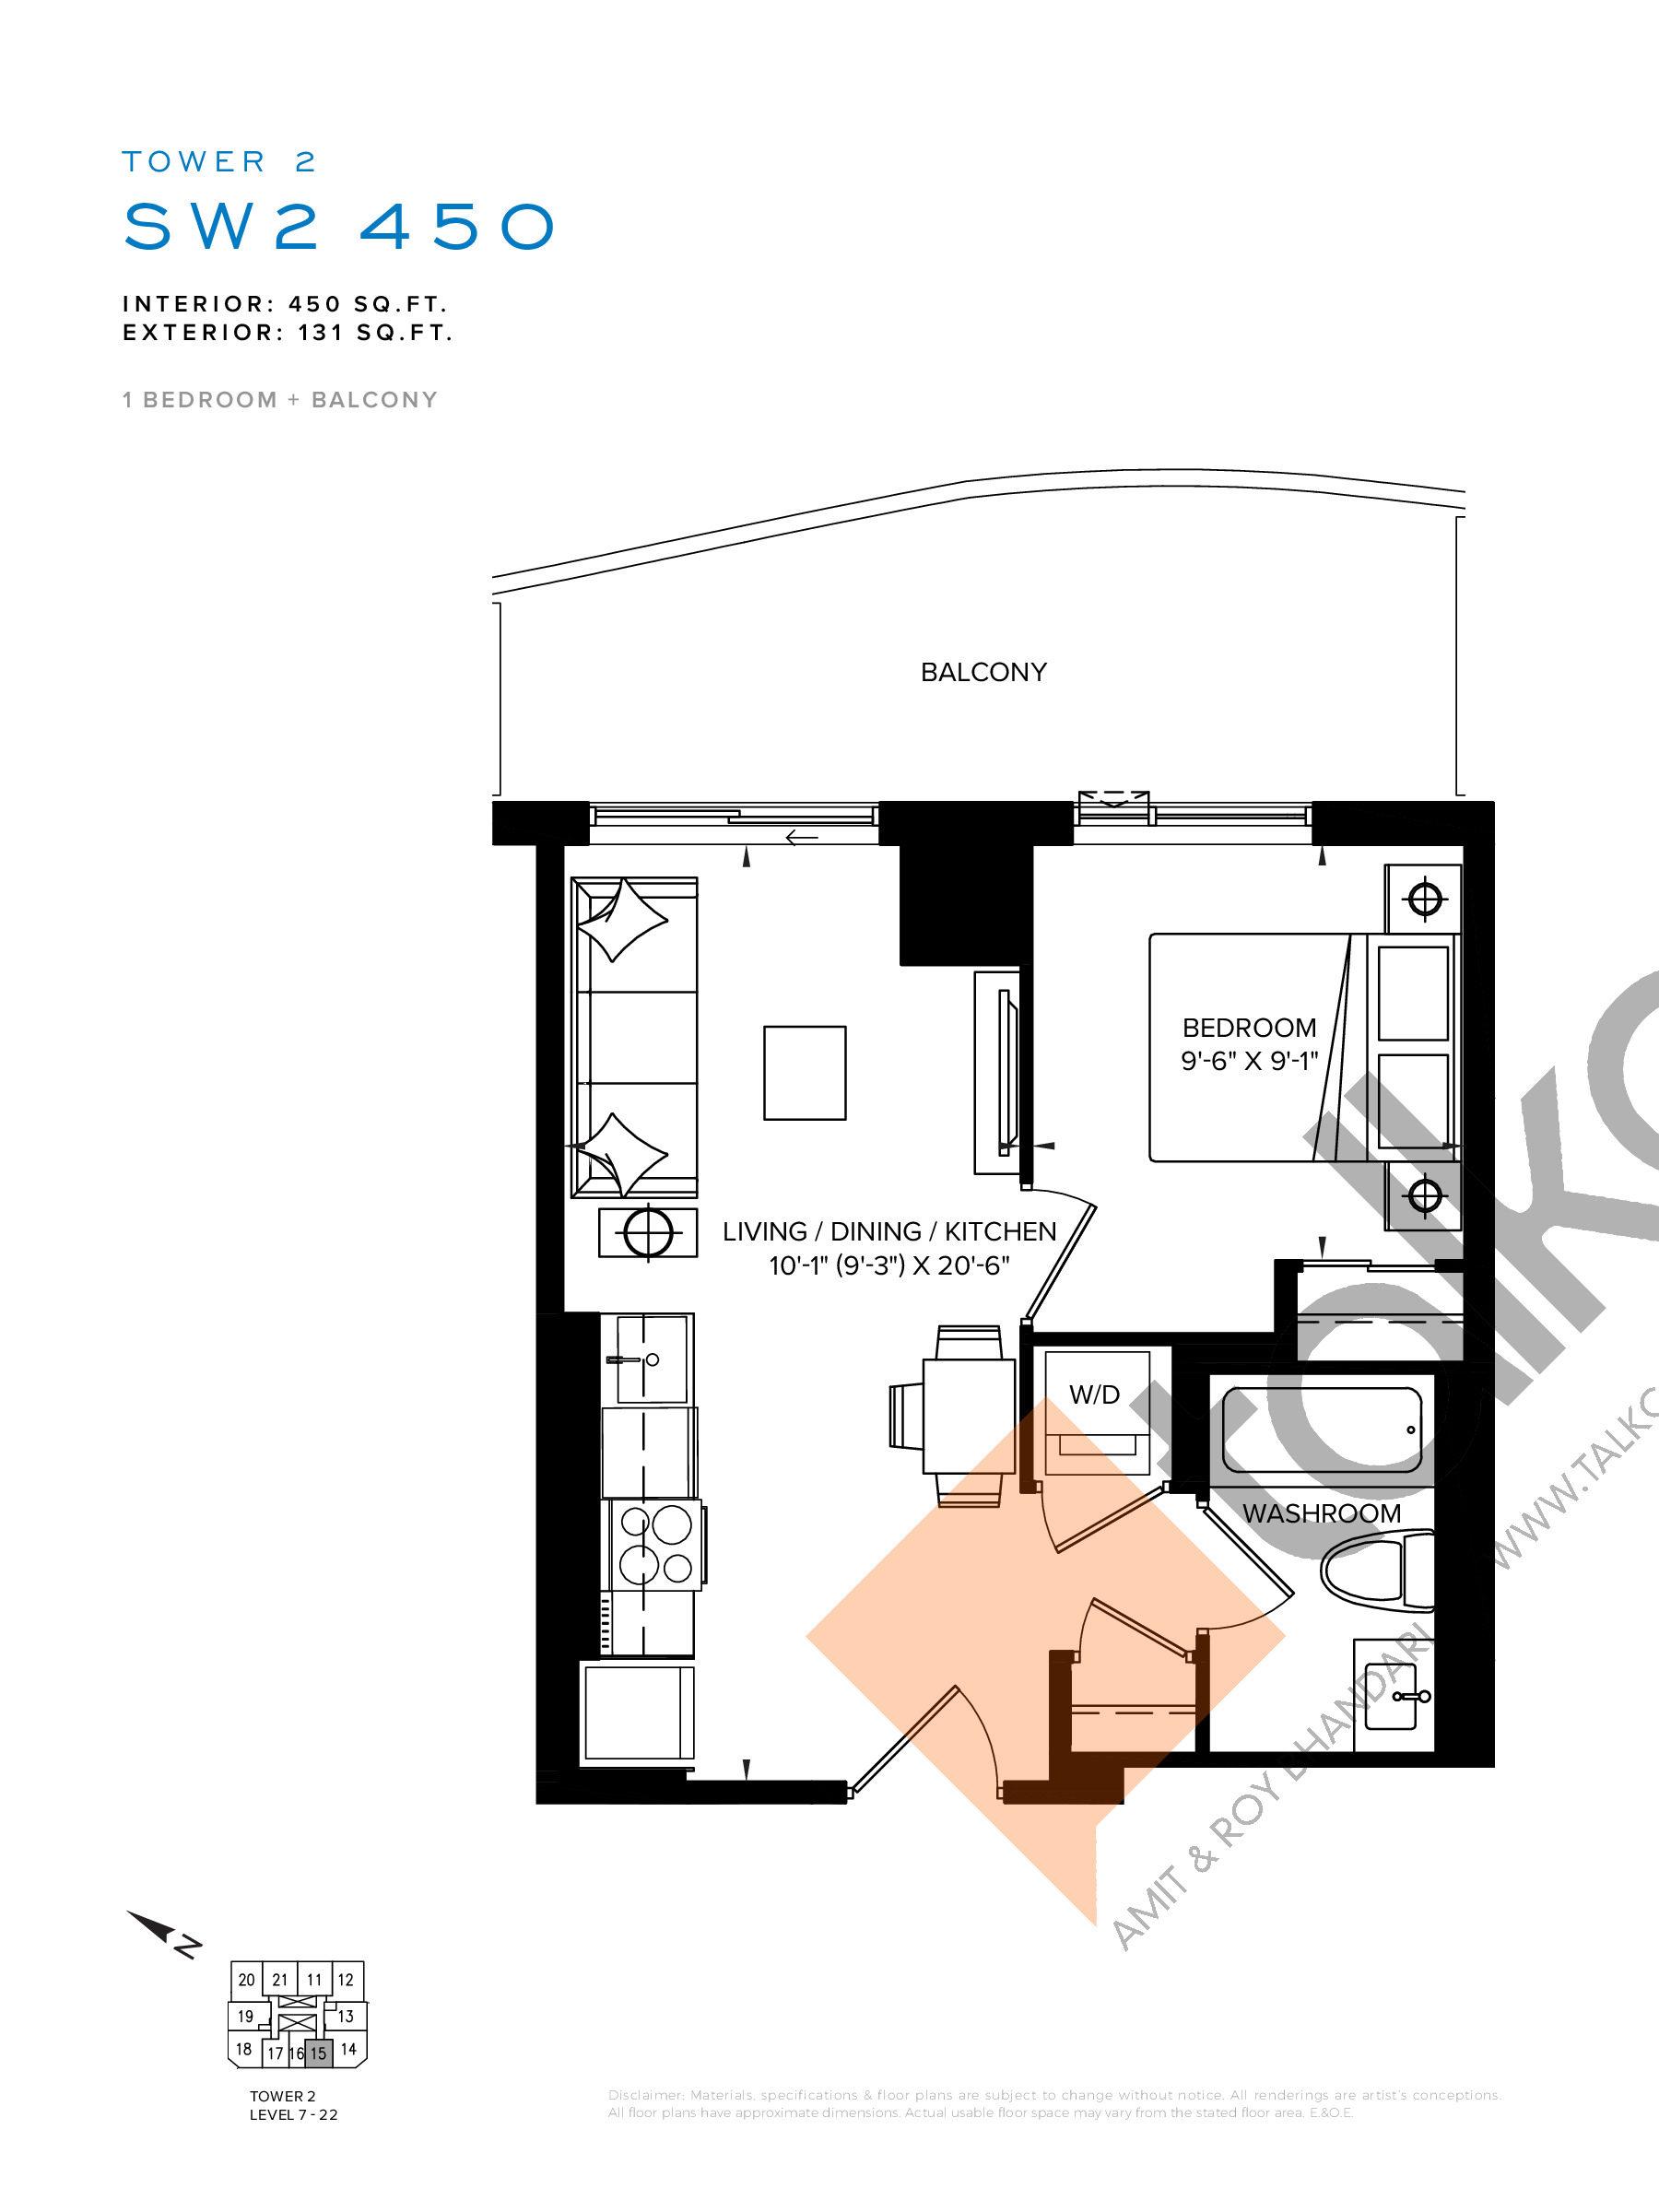 SW2 450 Floor Plan at SXSW Tower 2 Condos (SXSW2) - 450 sq.ft